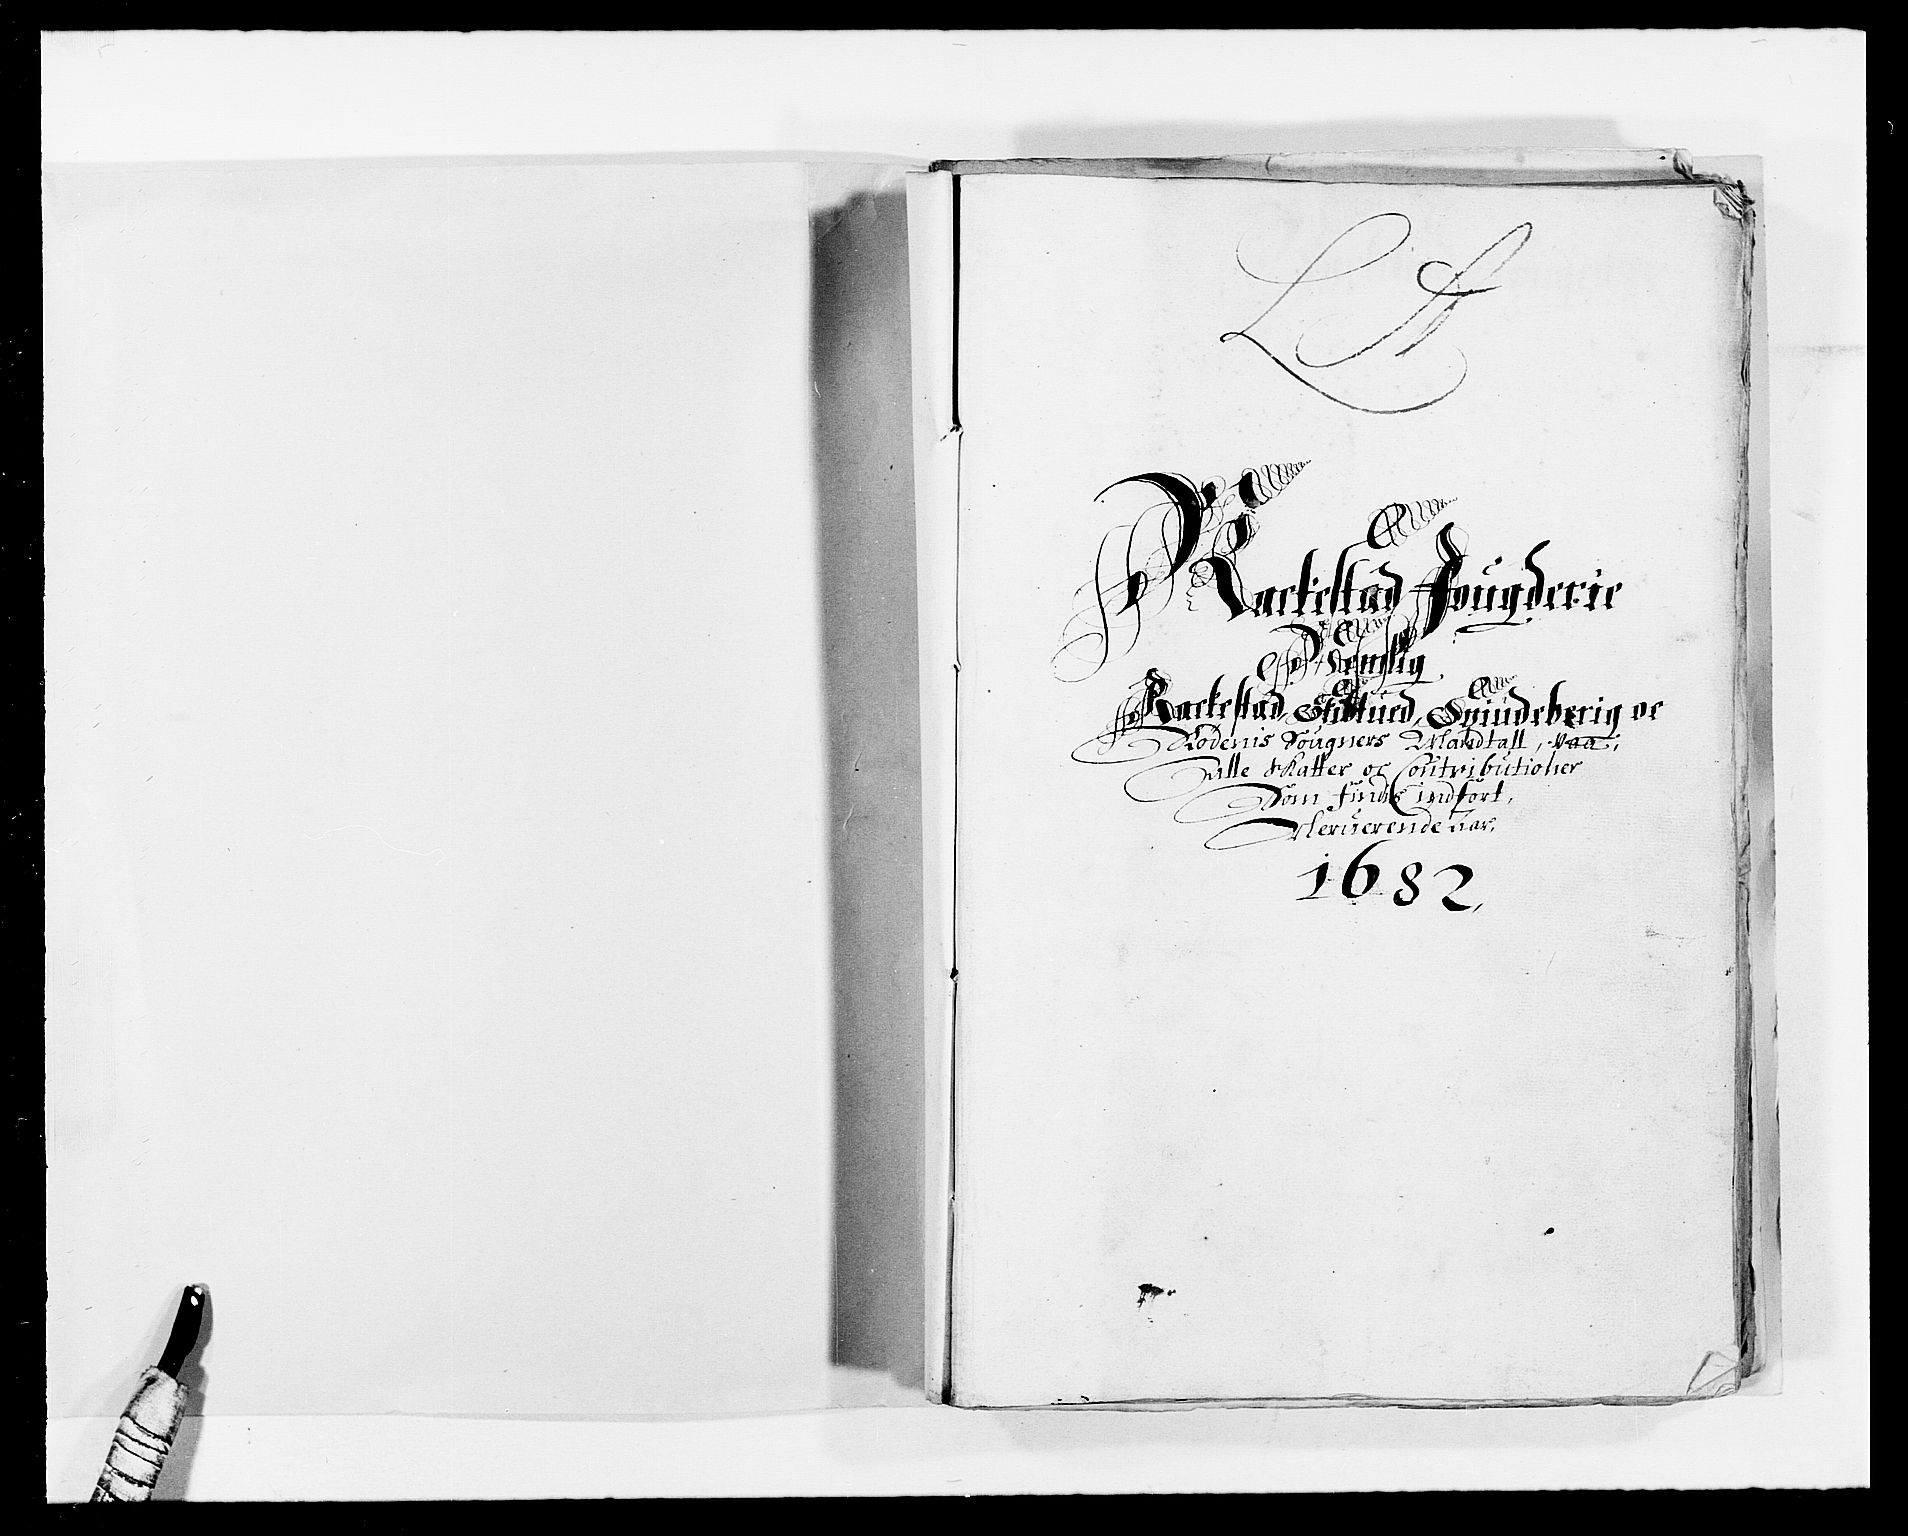 RA, Rentekammeret inntil 1814, Reviderte regnskaper, Fogderegnskap, R05/L0273: Fogderegnskap Rakkestad, 1682, s. 2